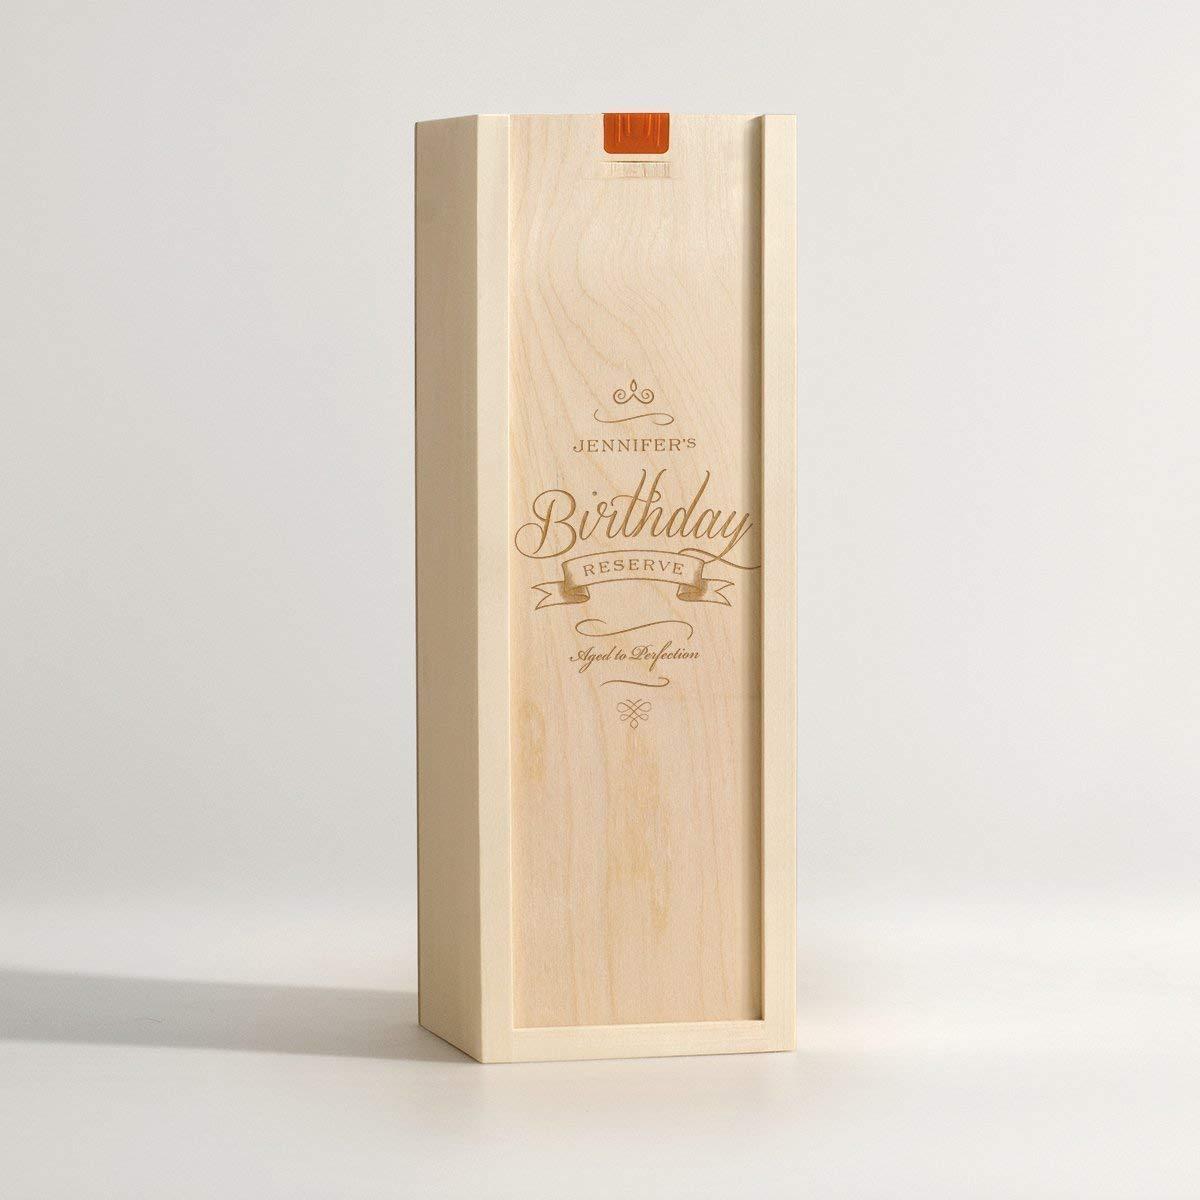 Personalized Birthday Wine Box - Fancy Birthday Reserve//Personalized Wine Box Gift